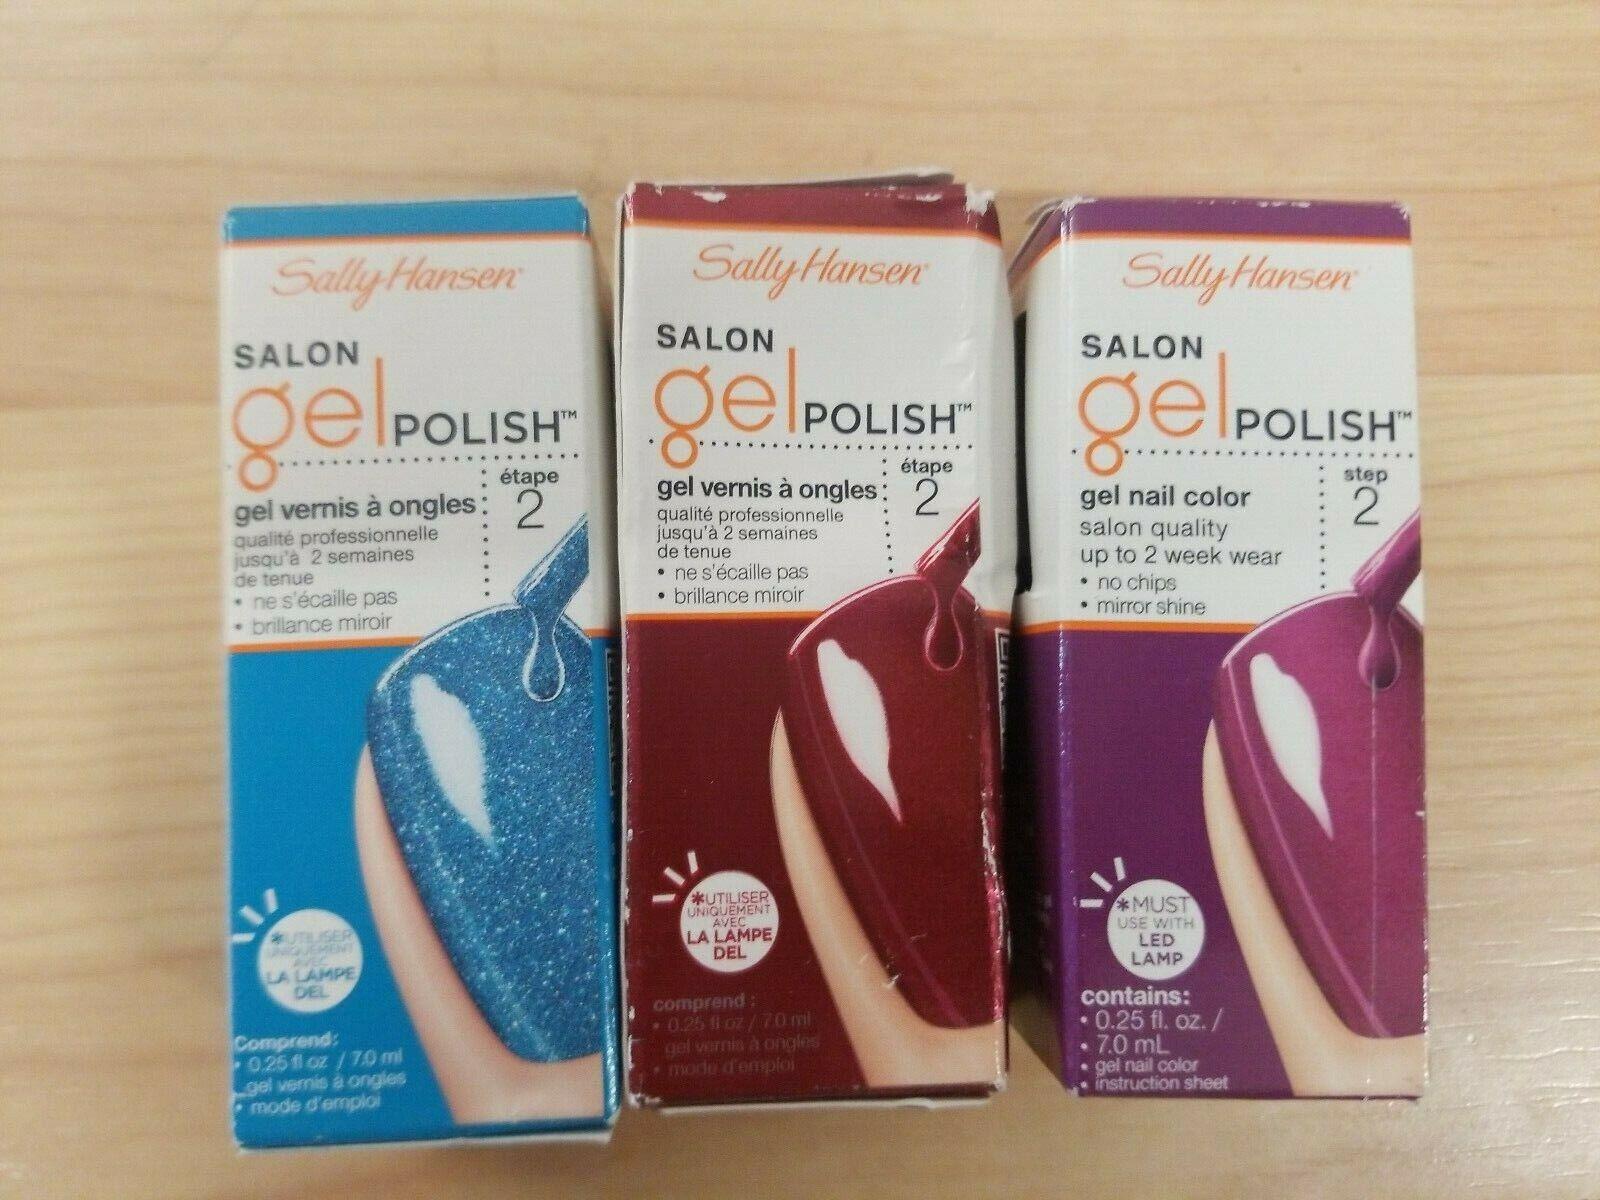 Salon Pro À Pro sally hansen salon pro gel step 2 gel polish 7 ml 0.25 oz choose color